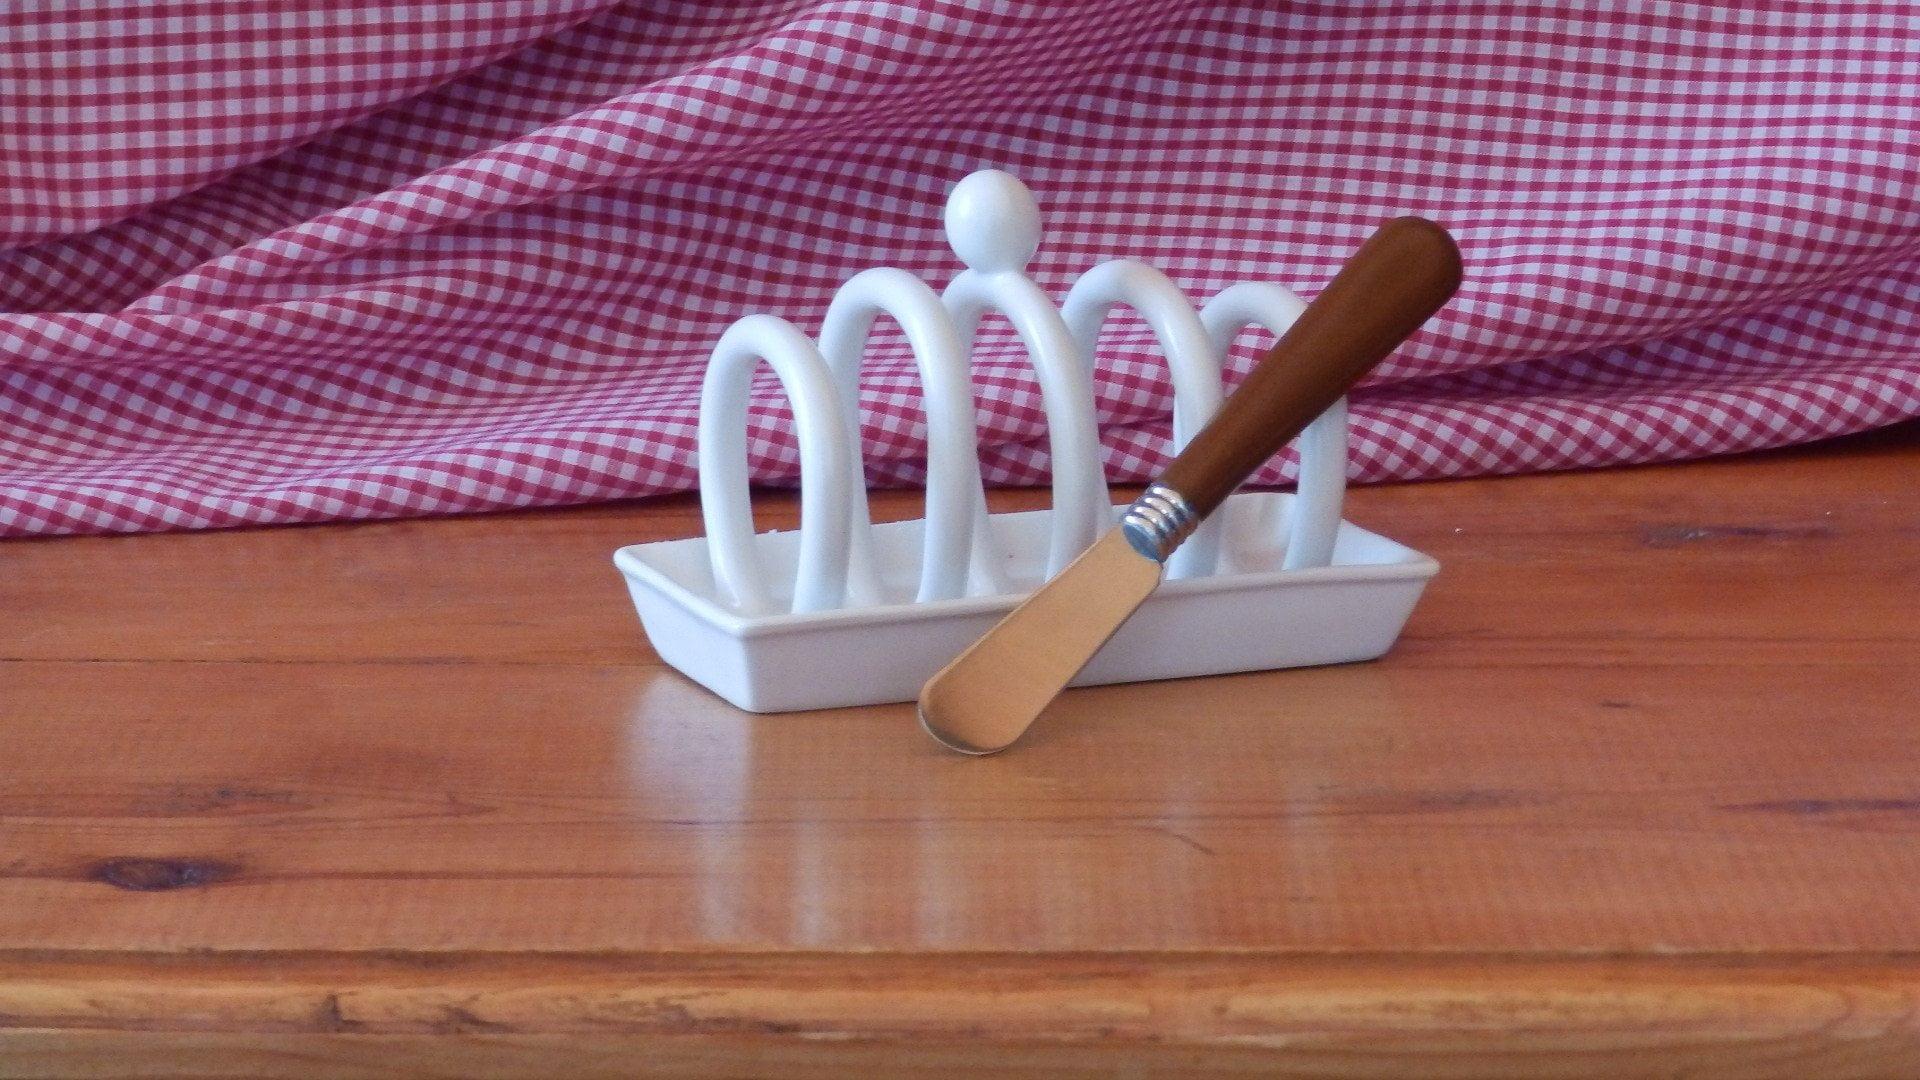 Toast rack and knife